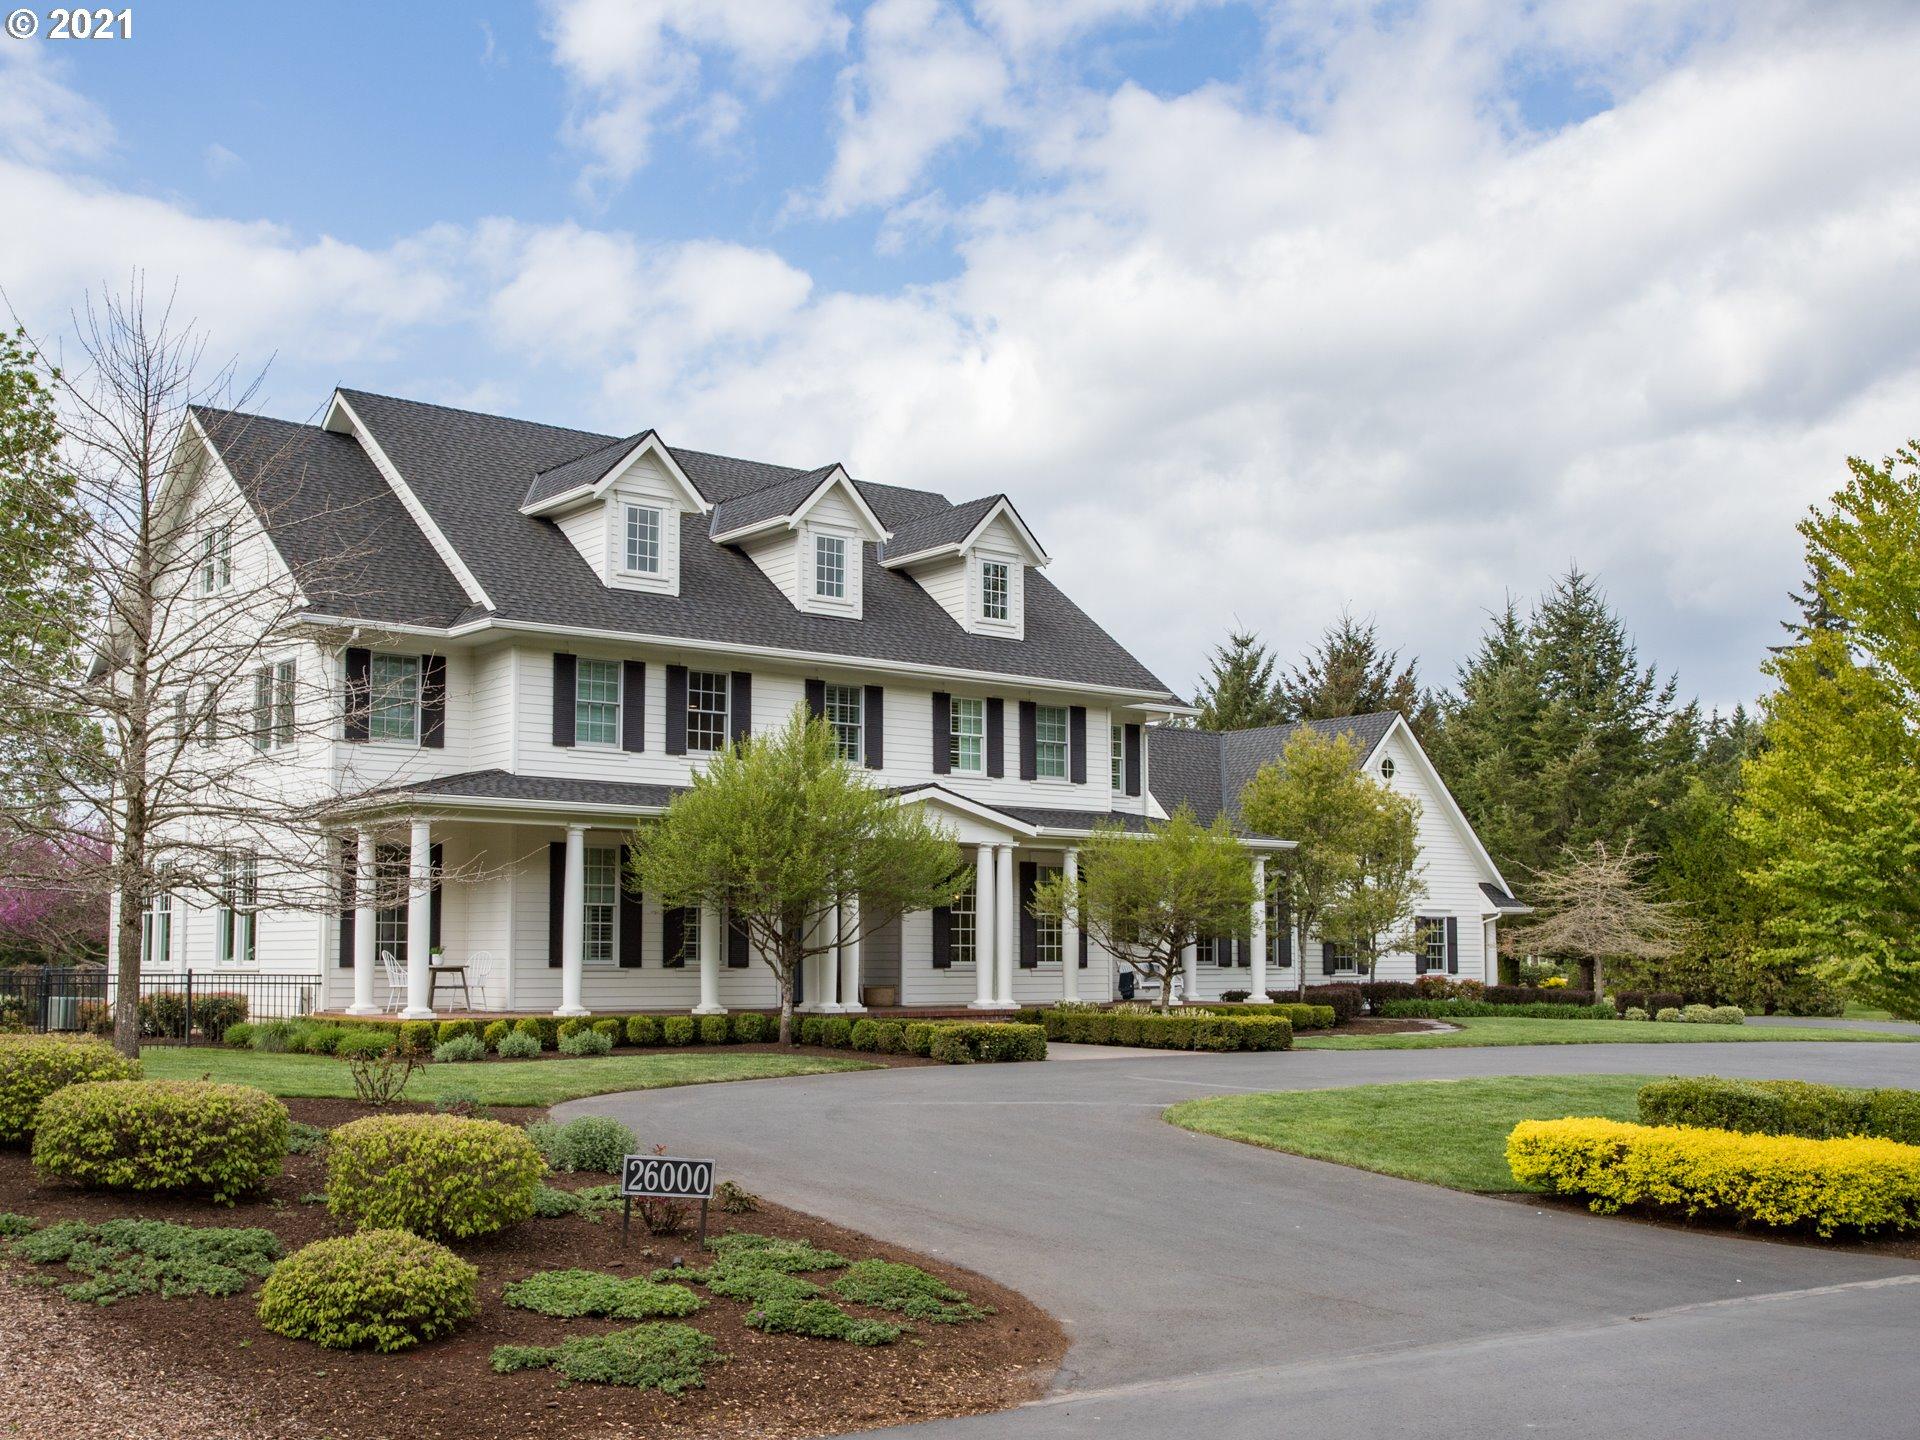 26000 NE 137TH CT, Battle Ground, Washington 98604, 5 Bedrooms Bedrooms, ,5 BathroomsBathrooms,Single Family,For Sale,26000 NE 137TH CT,3,21362220